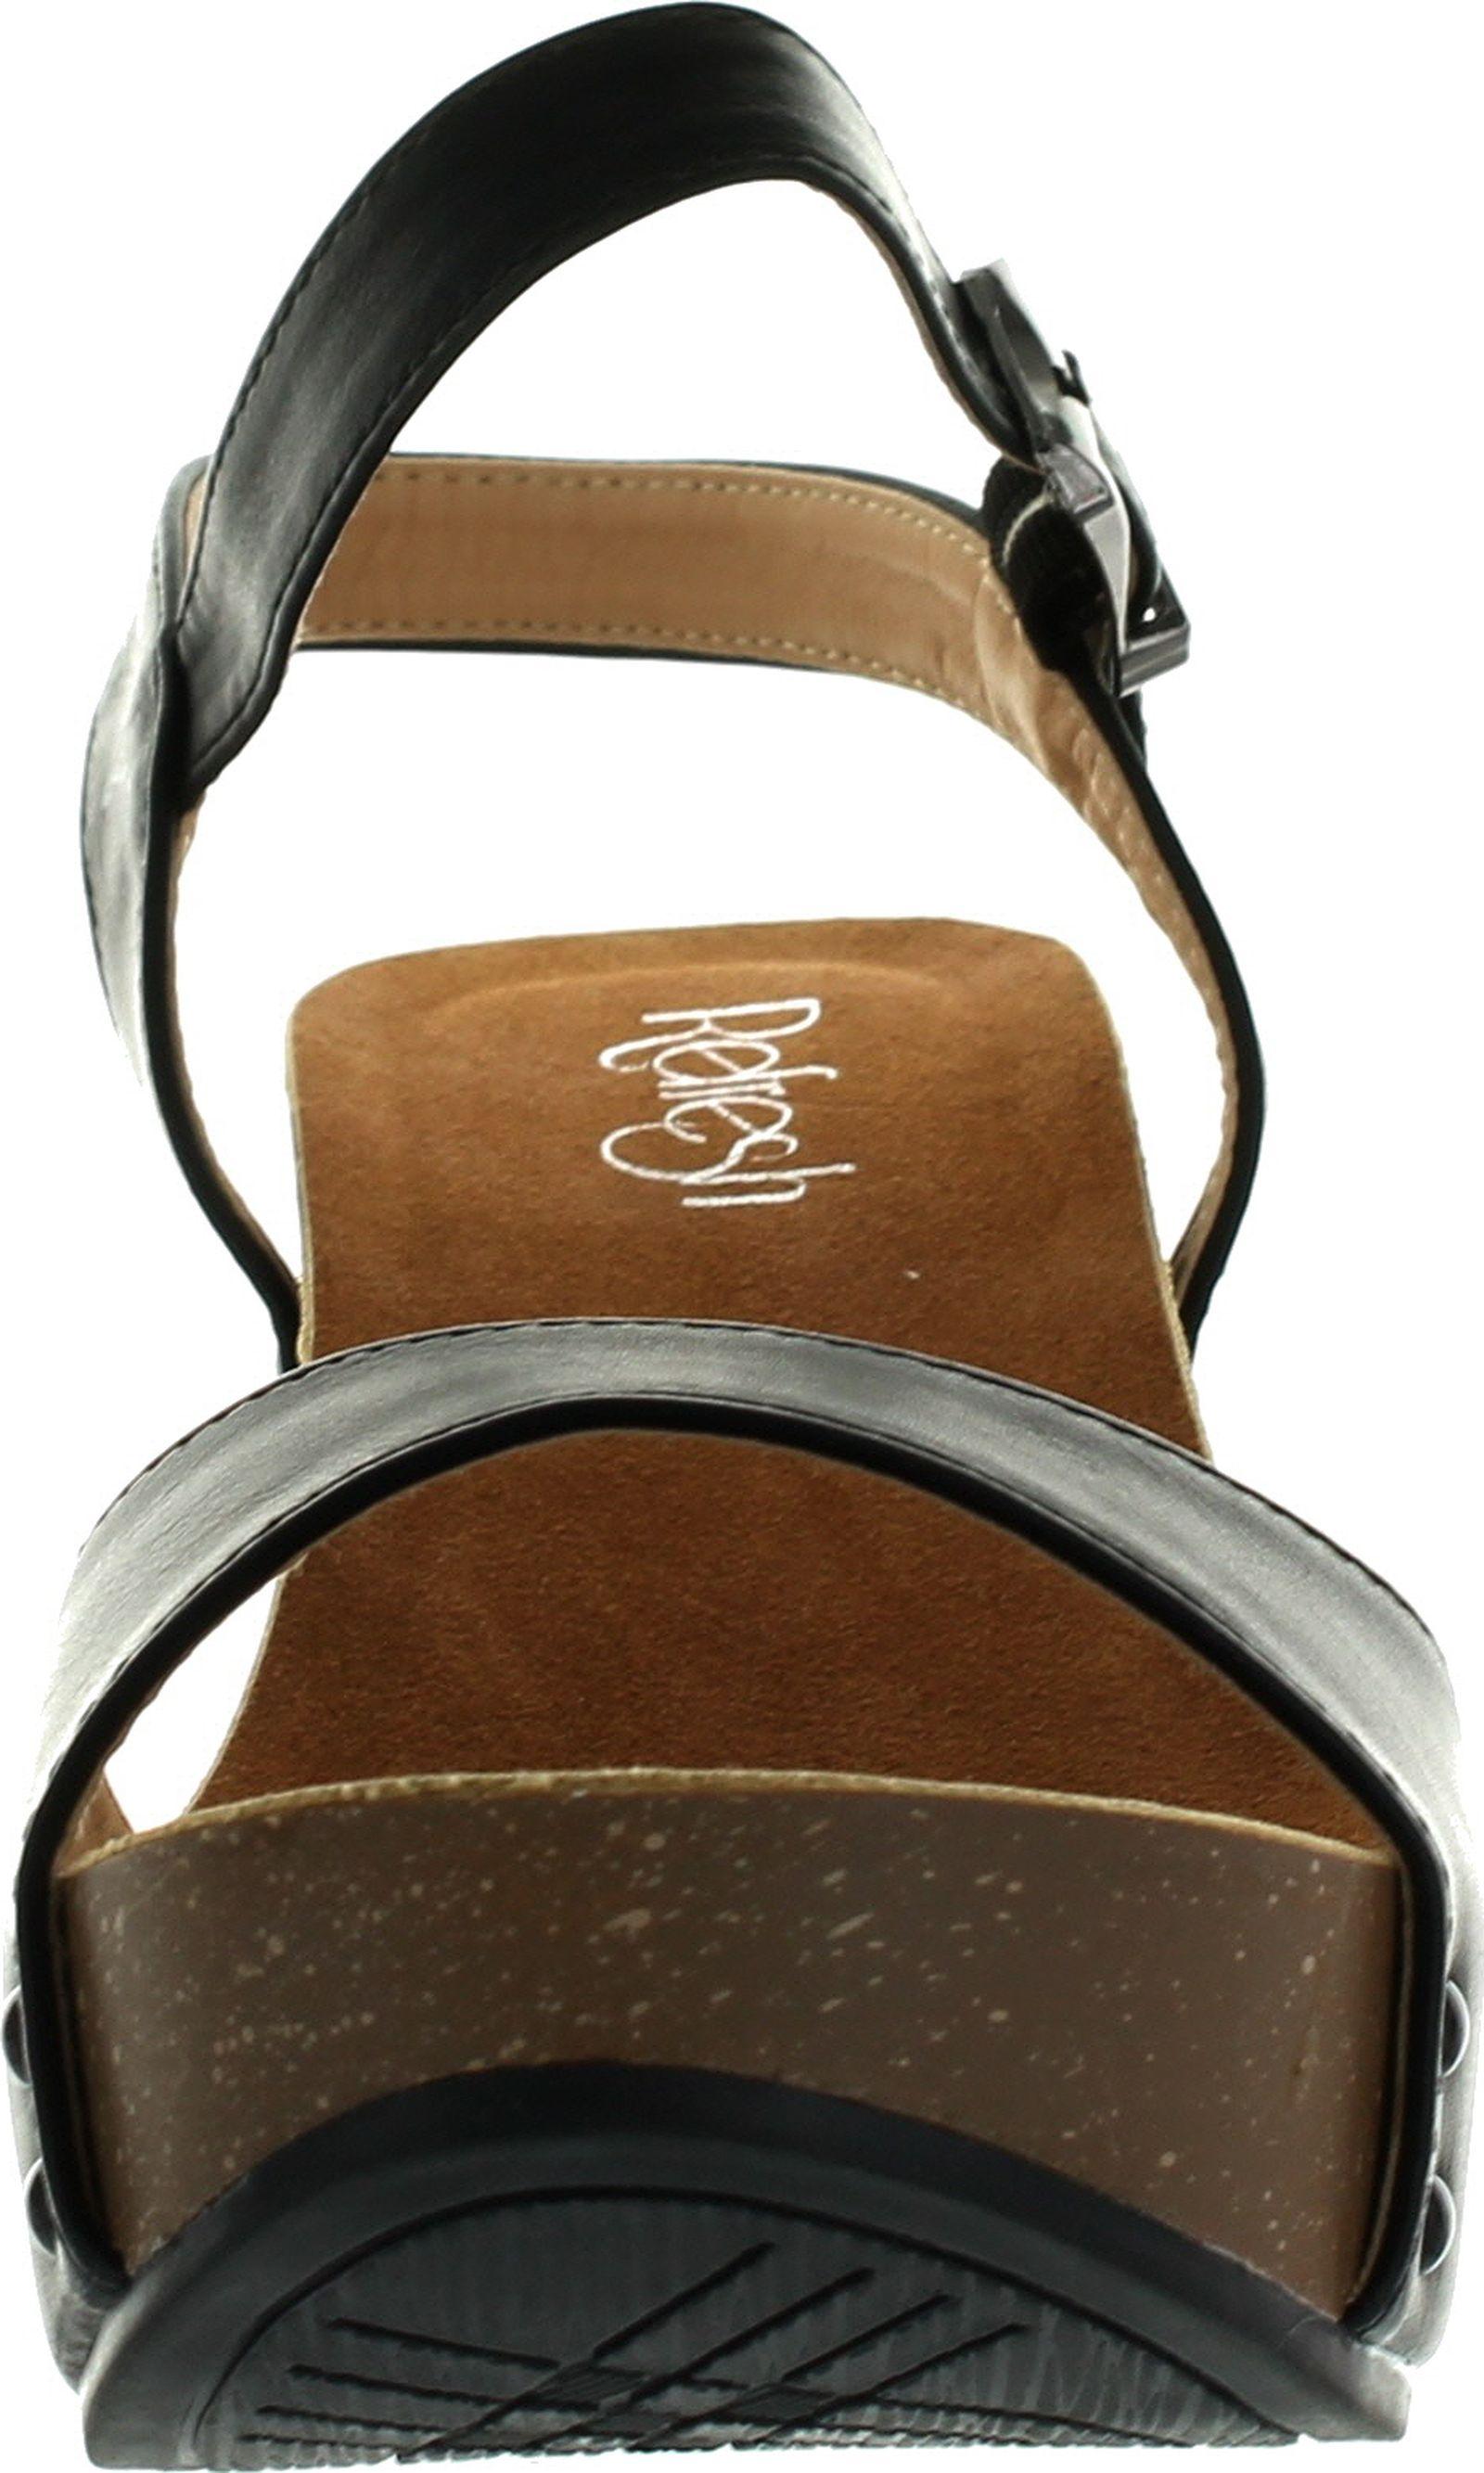 sandals honorine bocage smooth comfort leather gold comforter wedge